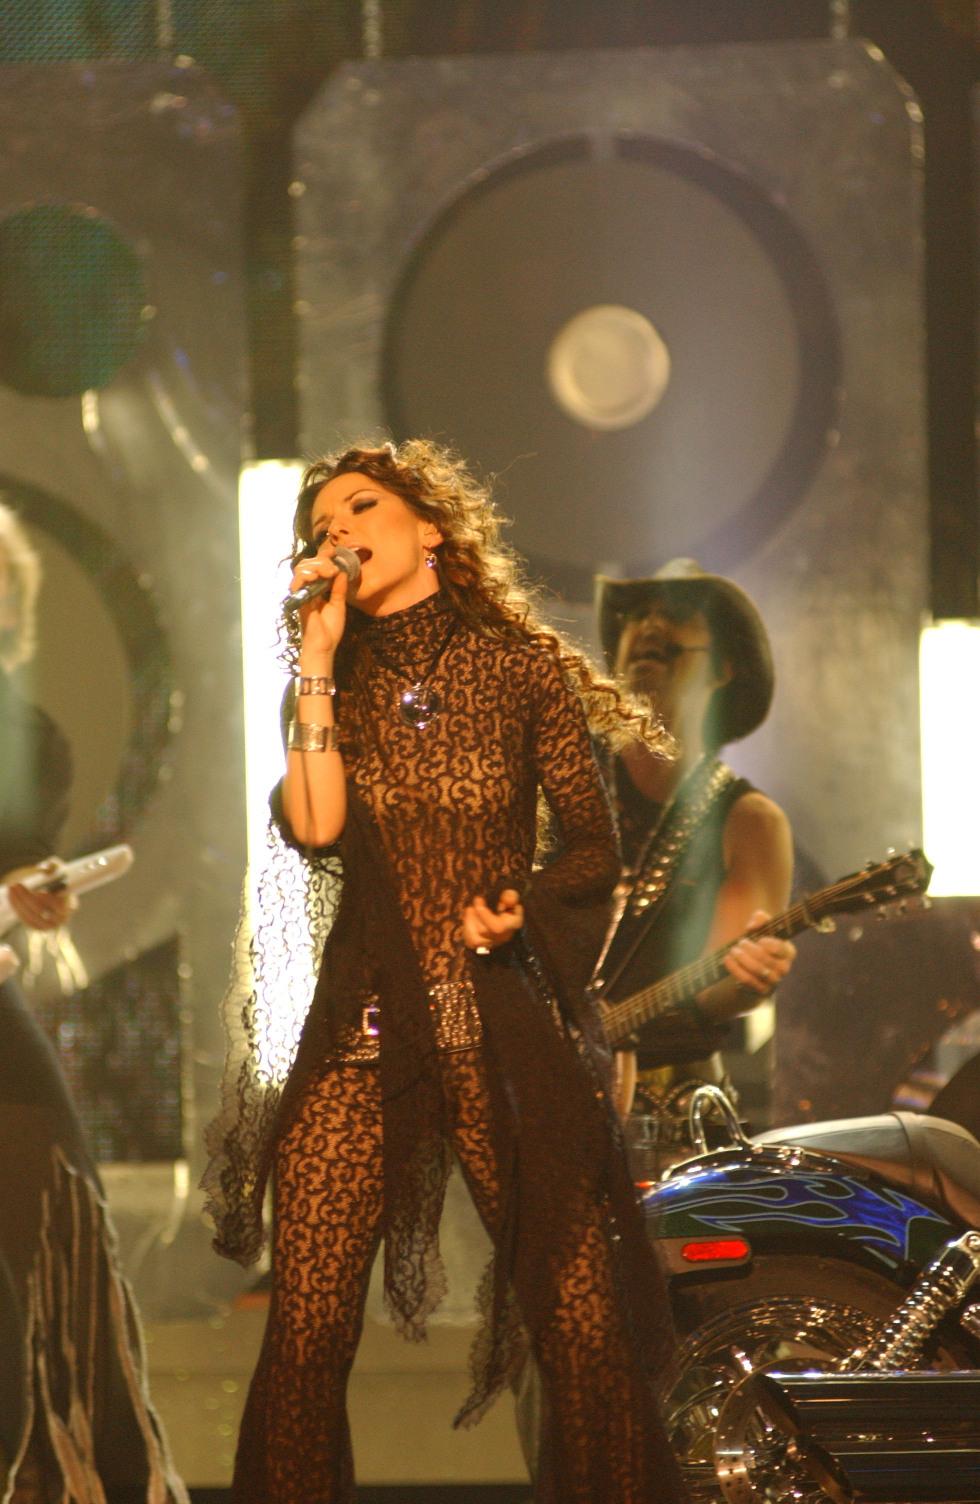 Live On Stage Shania Twain Cma 2002